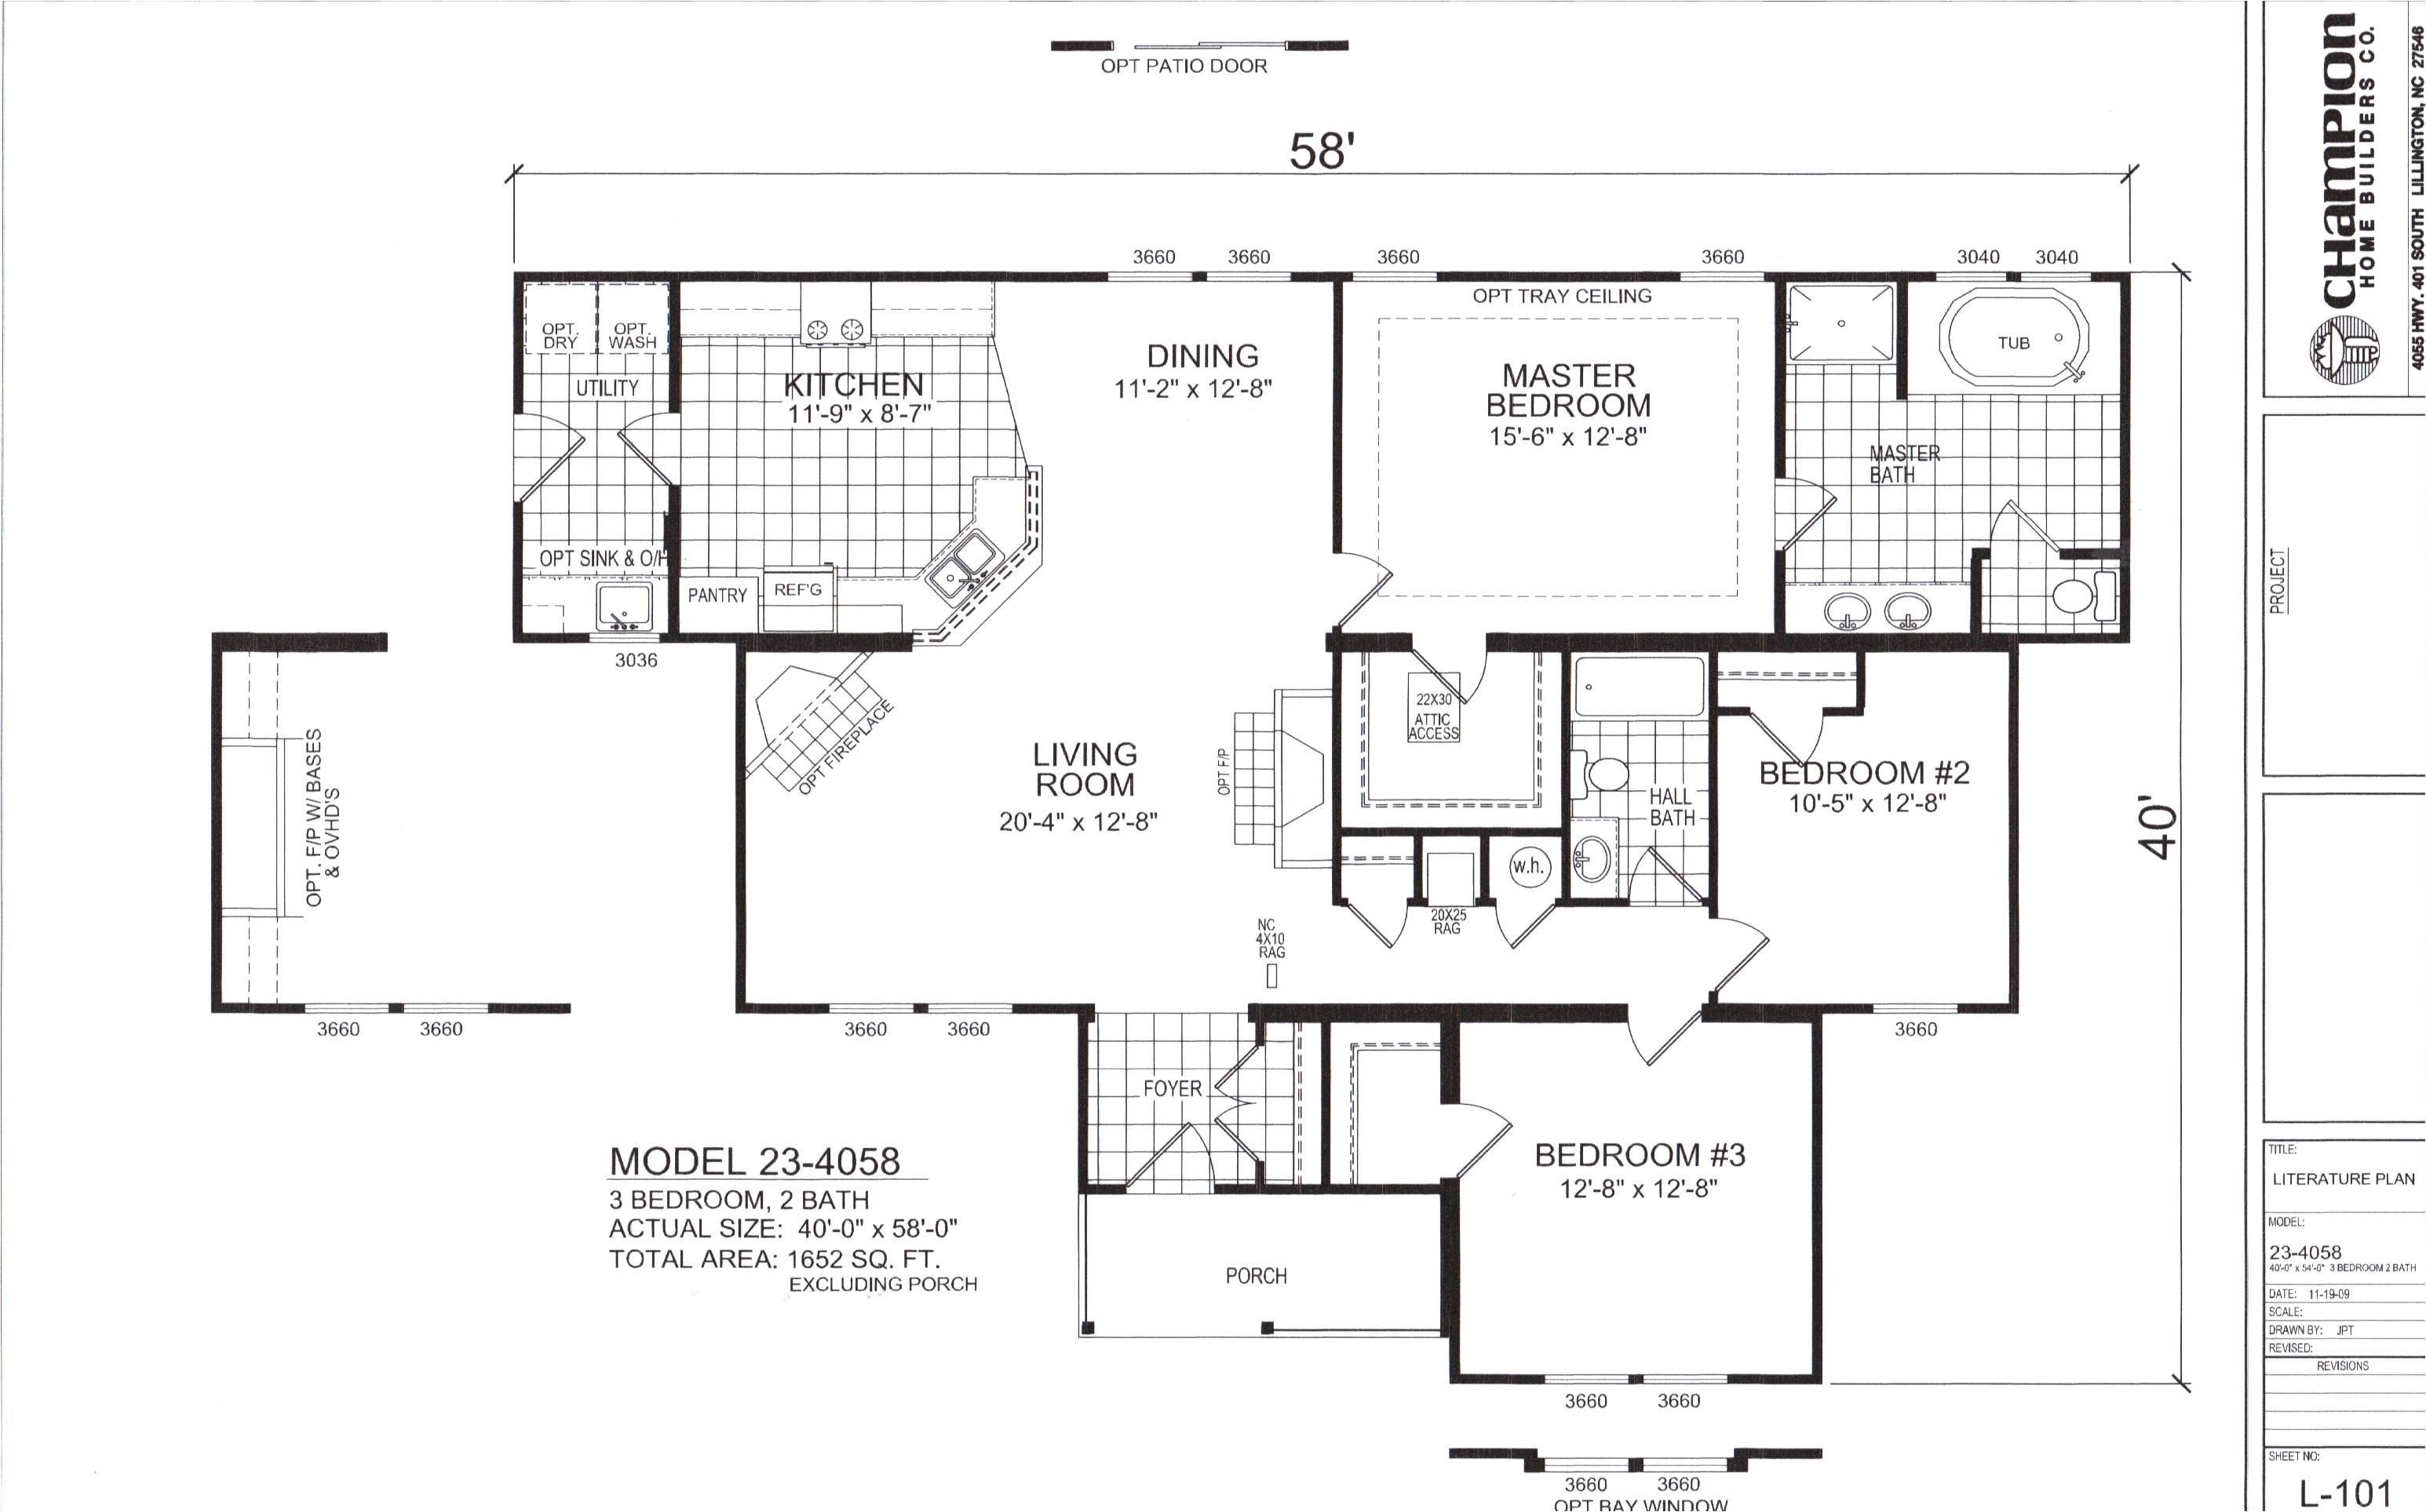 1998 Fleetwood Mobile Home Floor Plans 23 Luxury 1998 Fleetwood Mobile Home Floor Plans